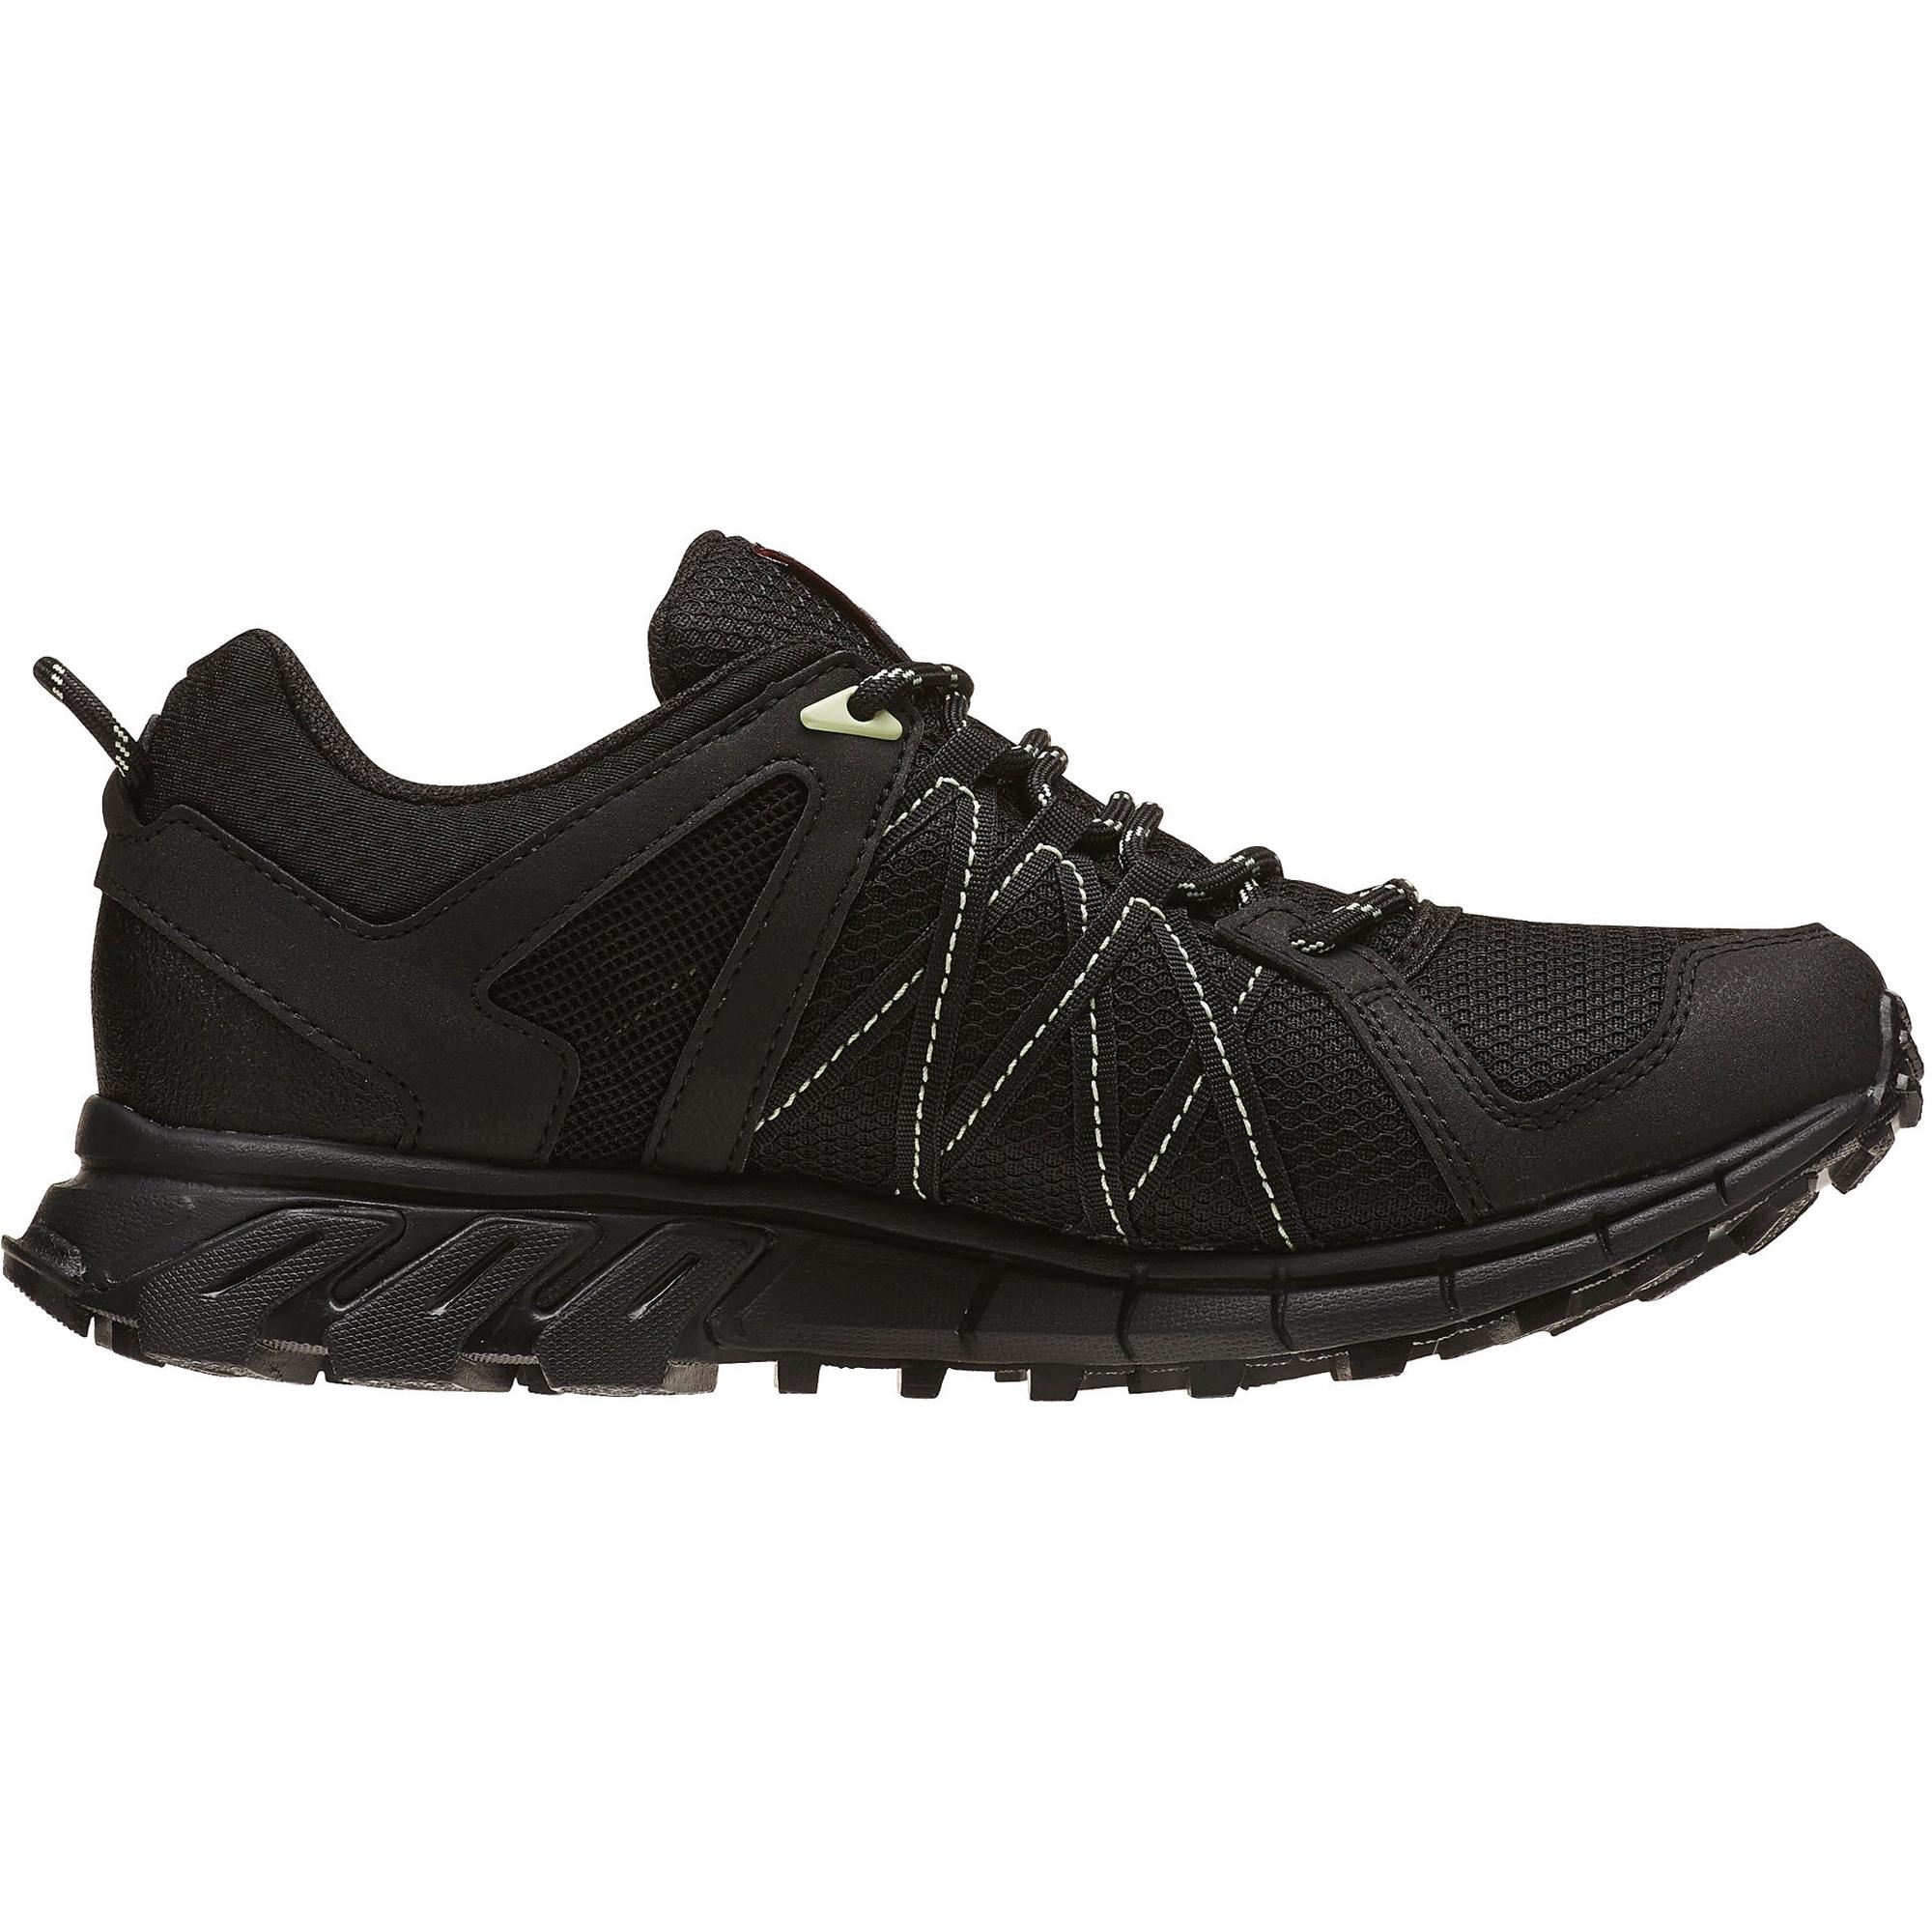 ZATENO | Reebok Damen Nordic Walkingschuh Trailgrip Rs 5.0